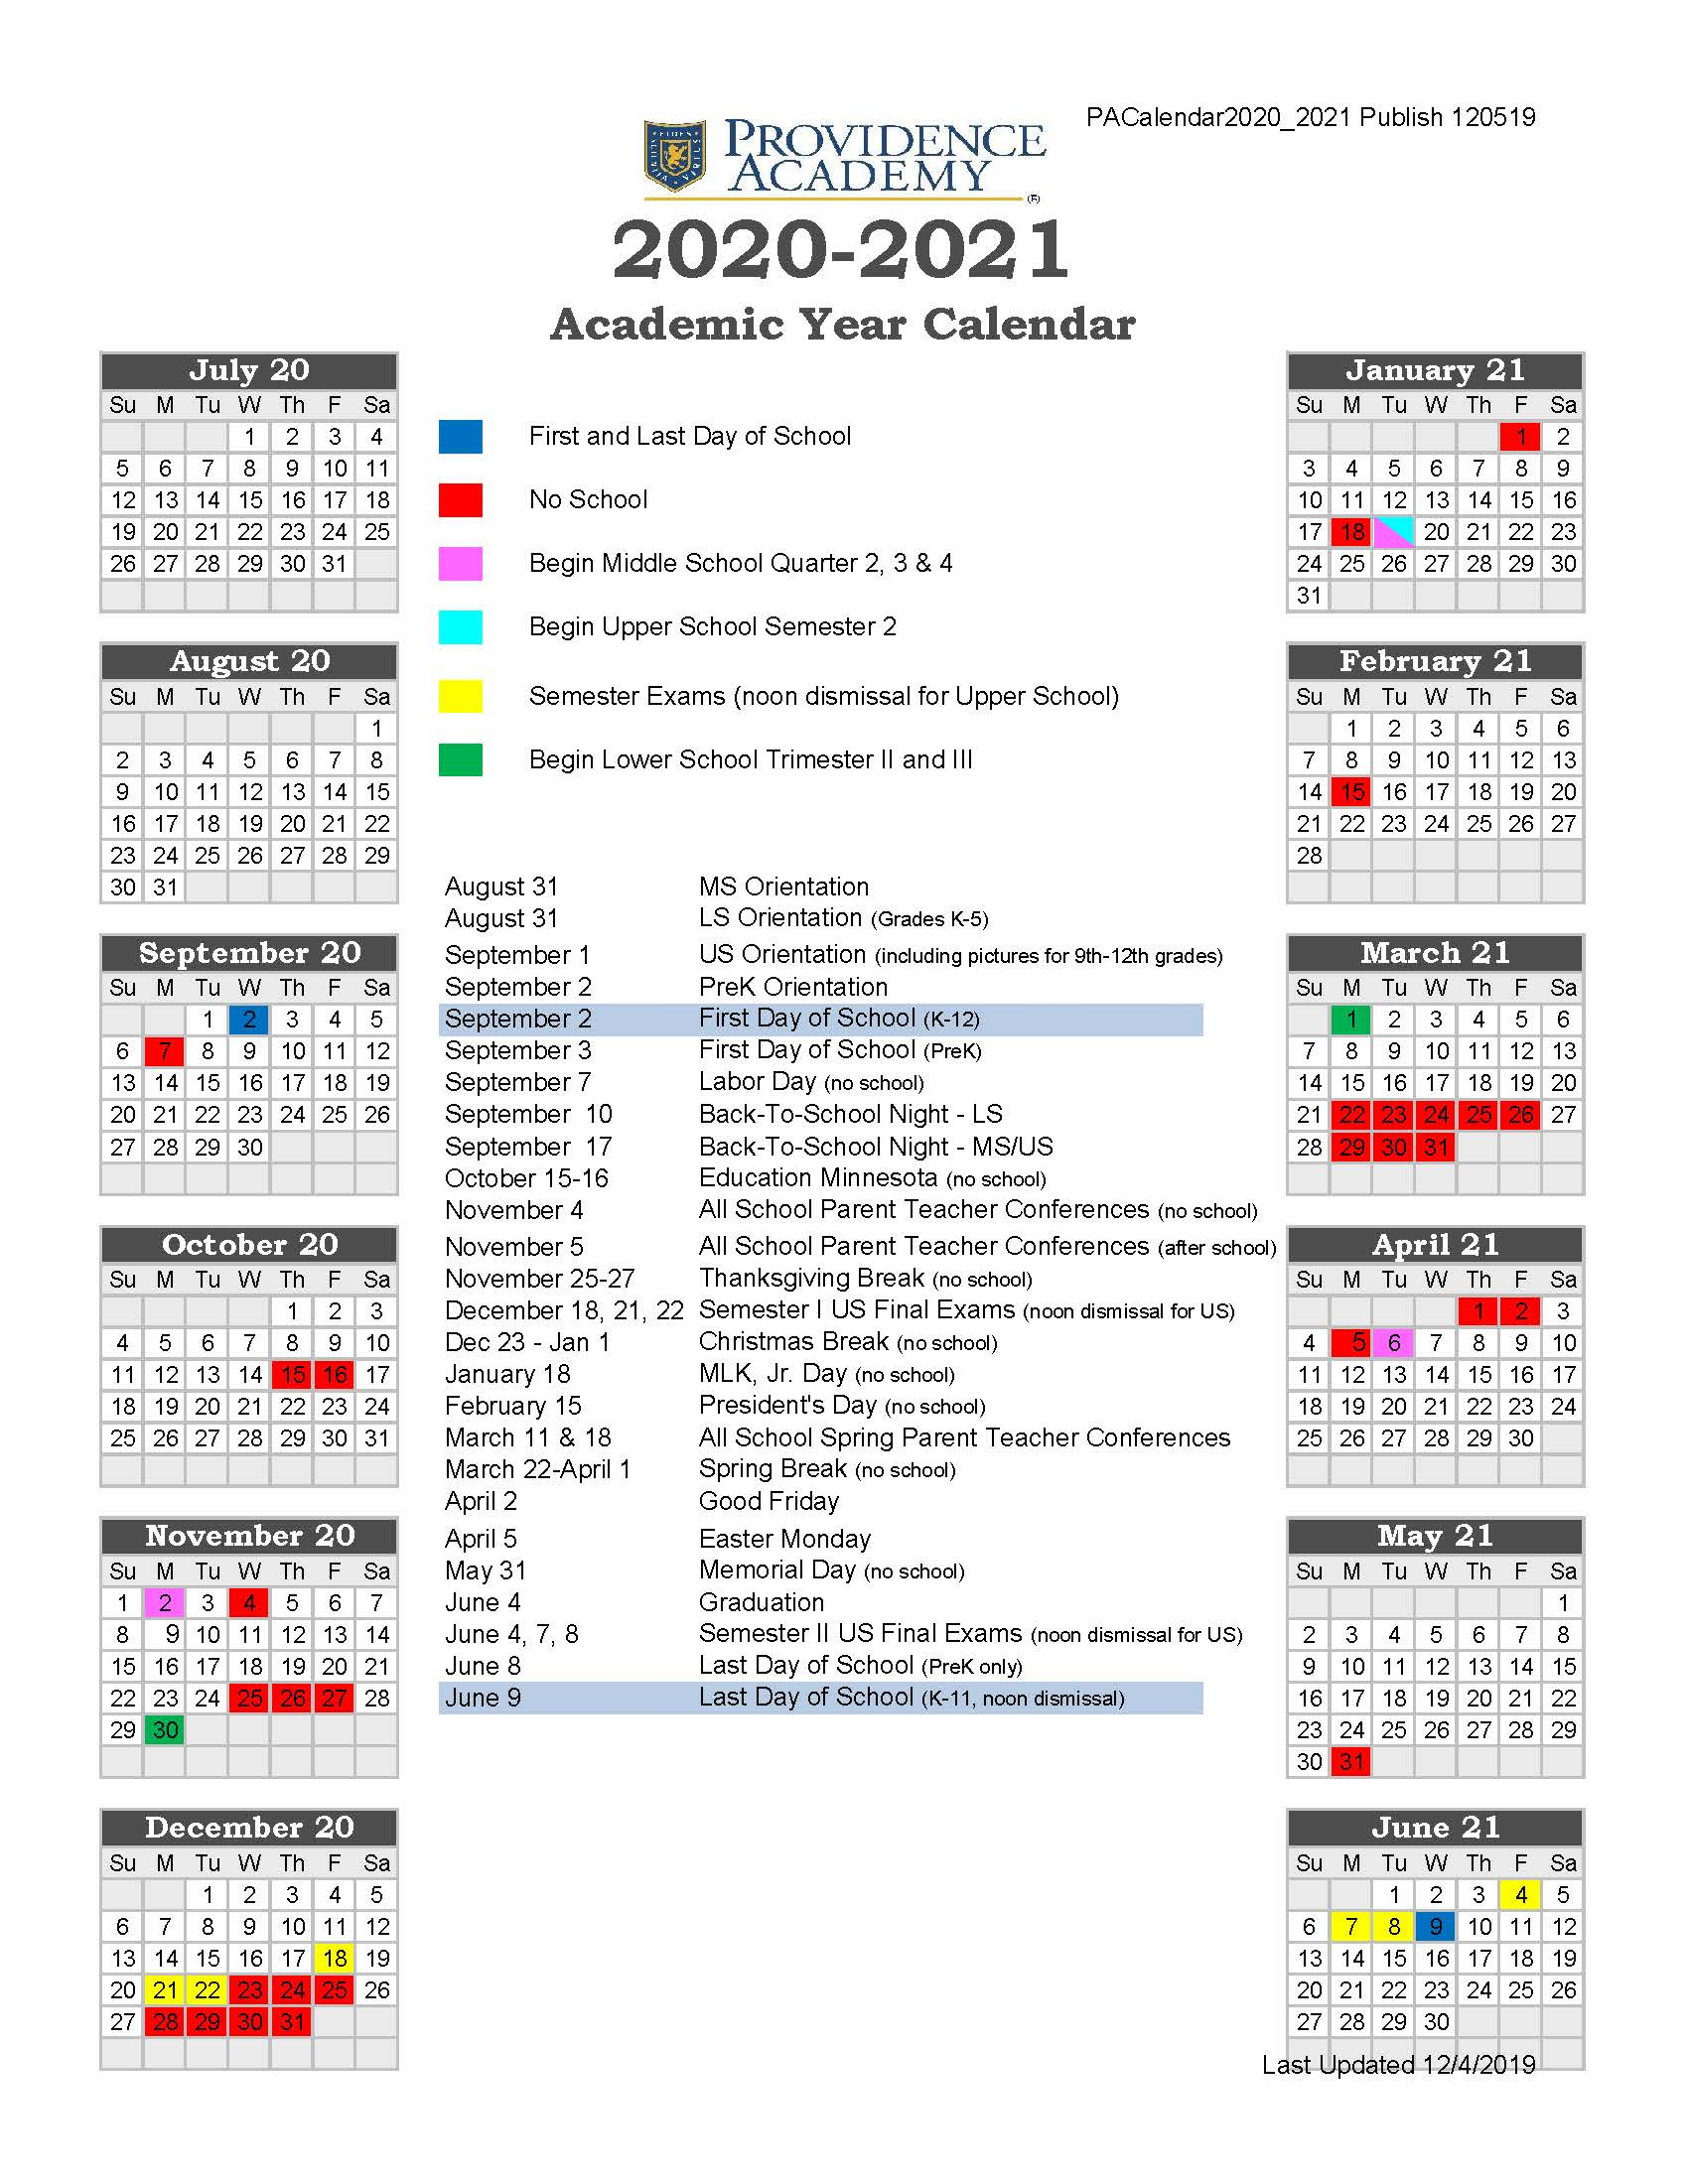 Gsu Fall 2021 Calendar | Printable Calendar 2020 2021 Throughout When Is Spring Break For Lake County Fl